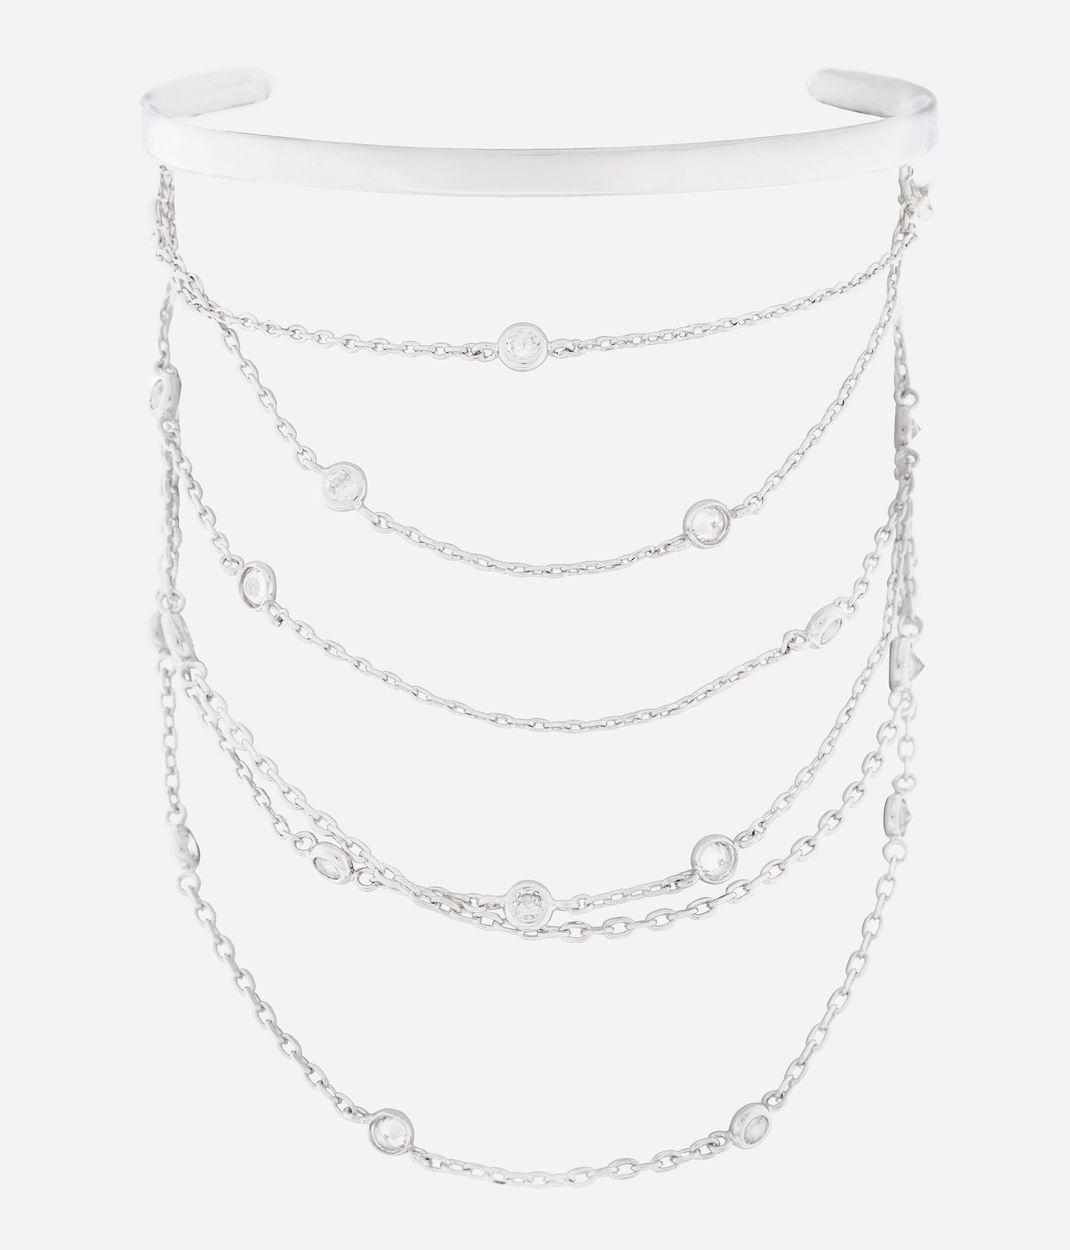 Luxe Uptown Swag Cuff Bracelet | New Arrivals | Henri Bendel